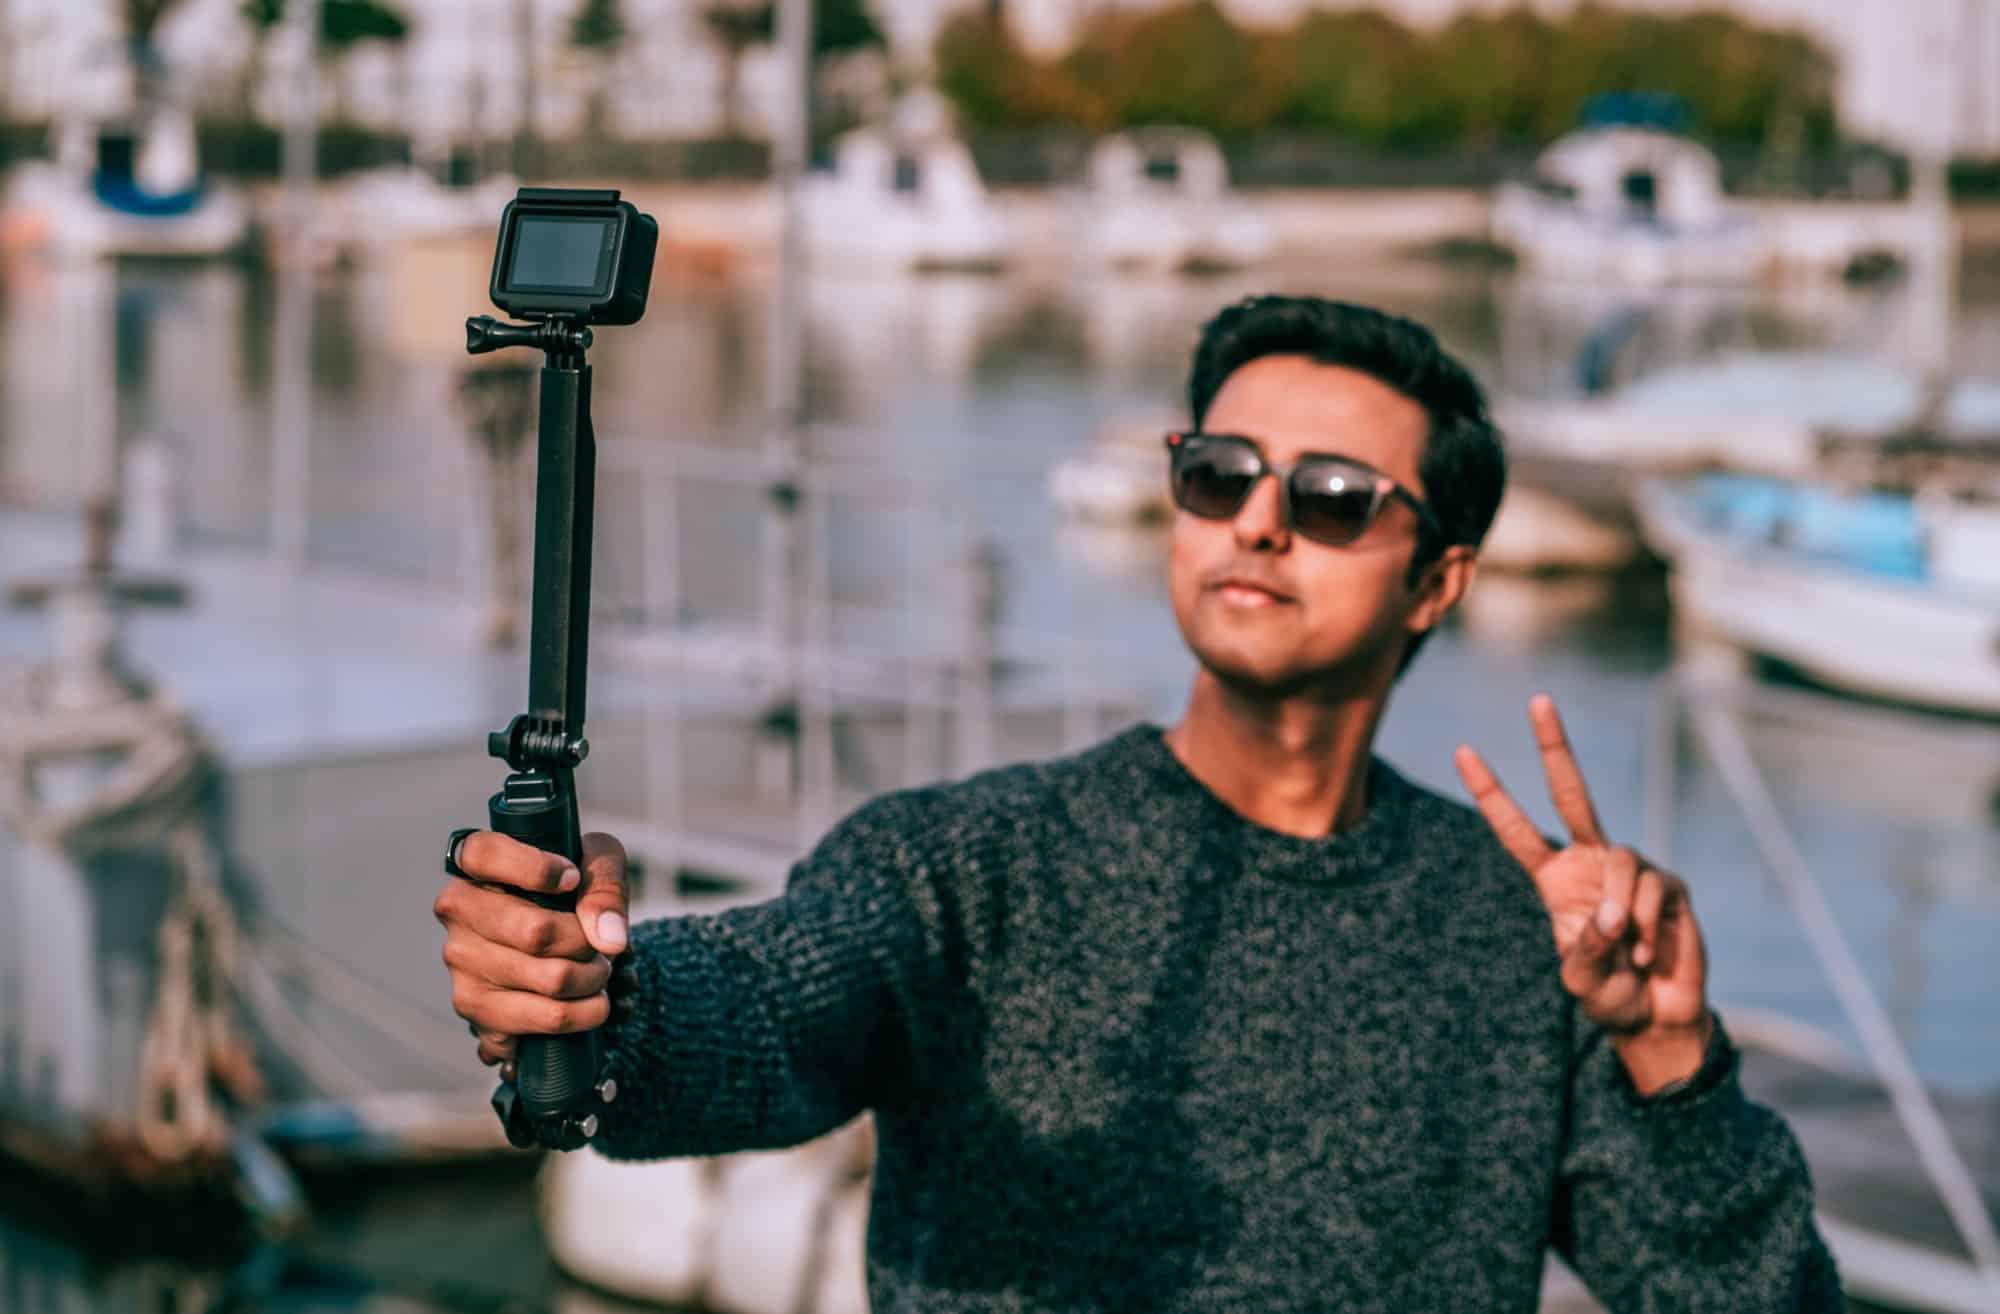 Boy using a selfie stick to take a selfie